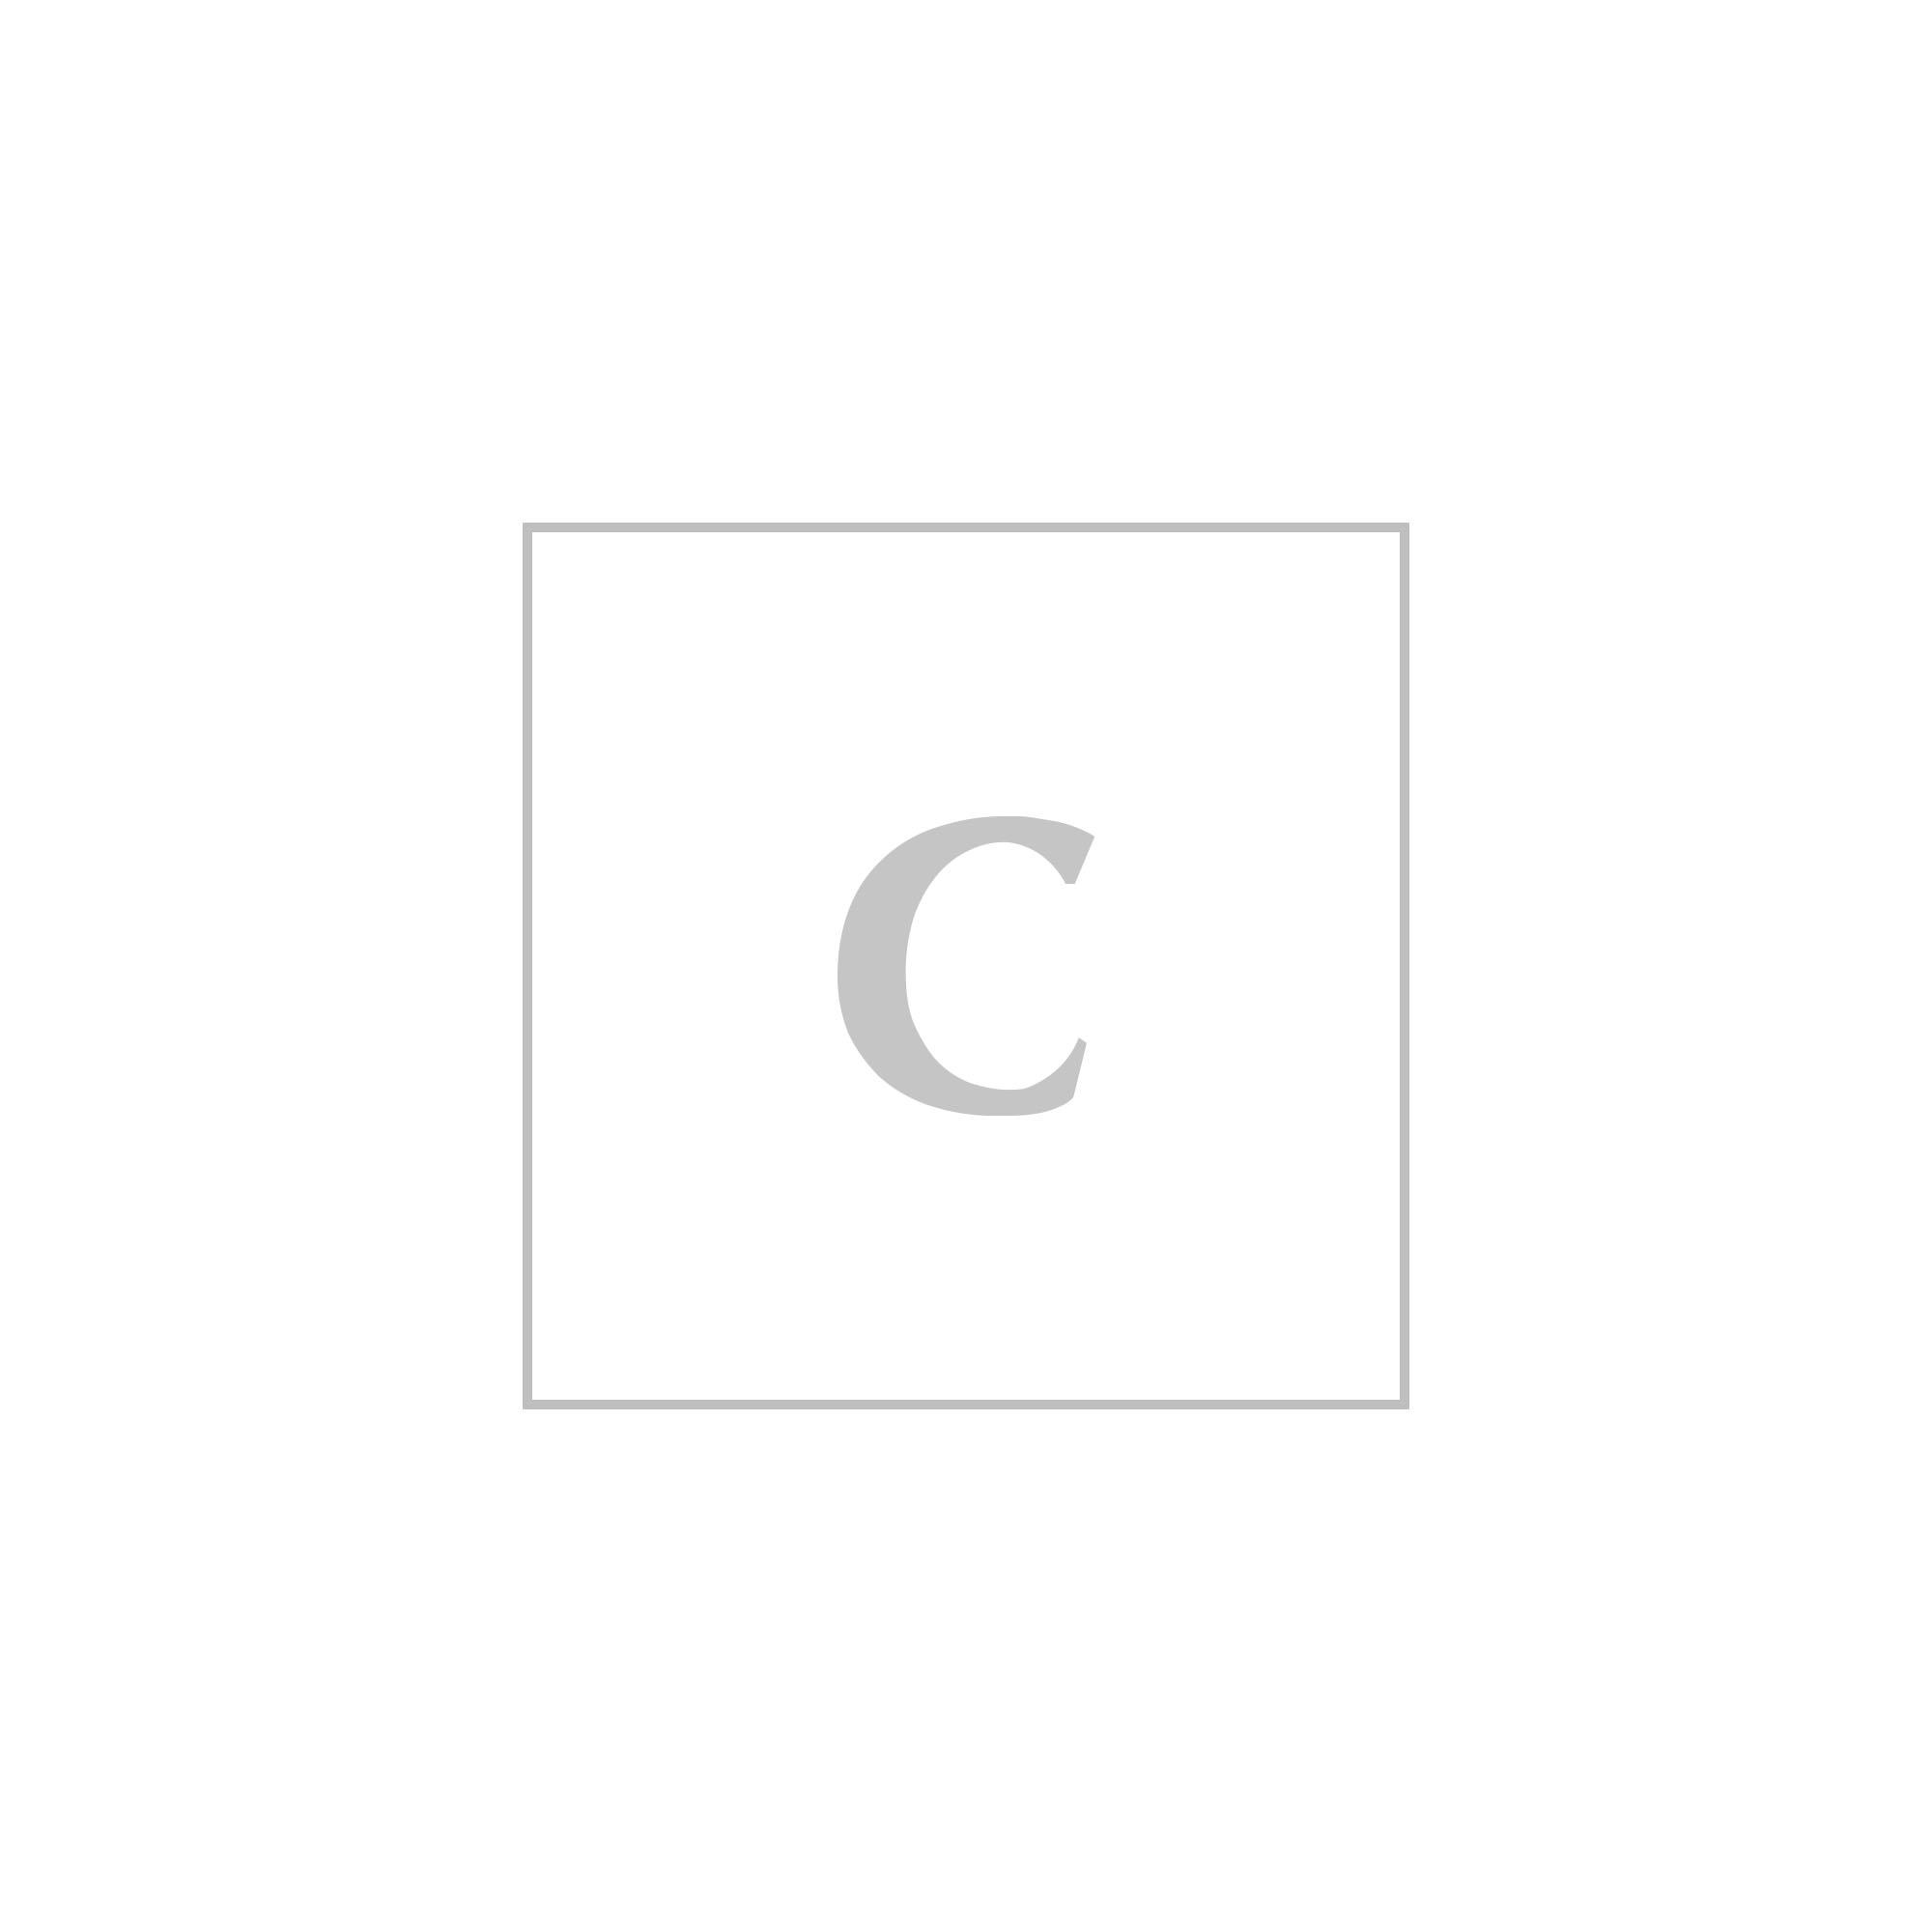 Dolce & gabbana phone case 6 pelle stampa iguana